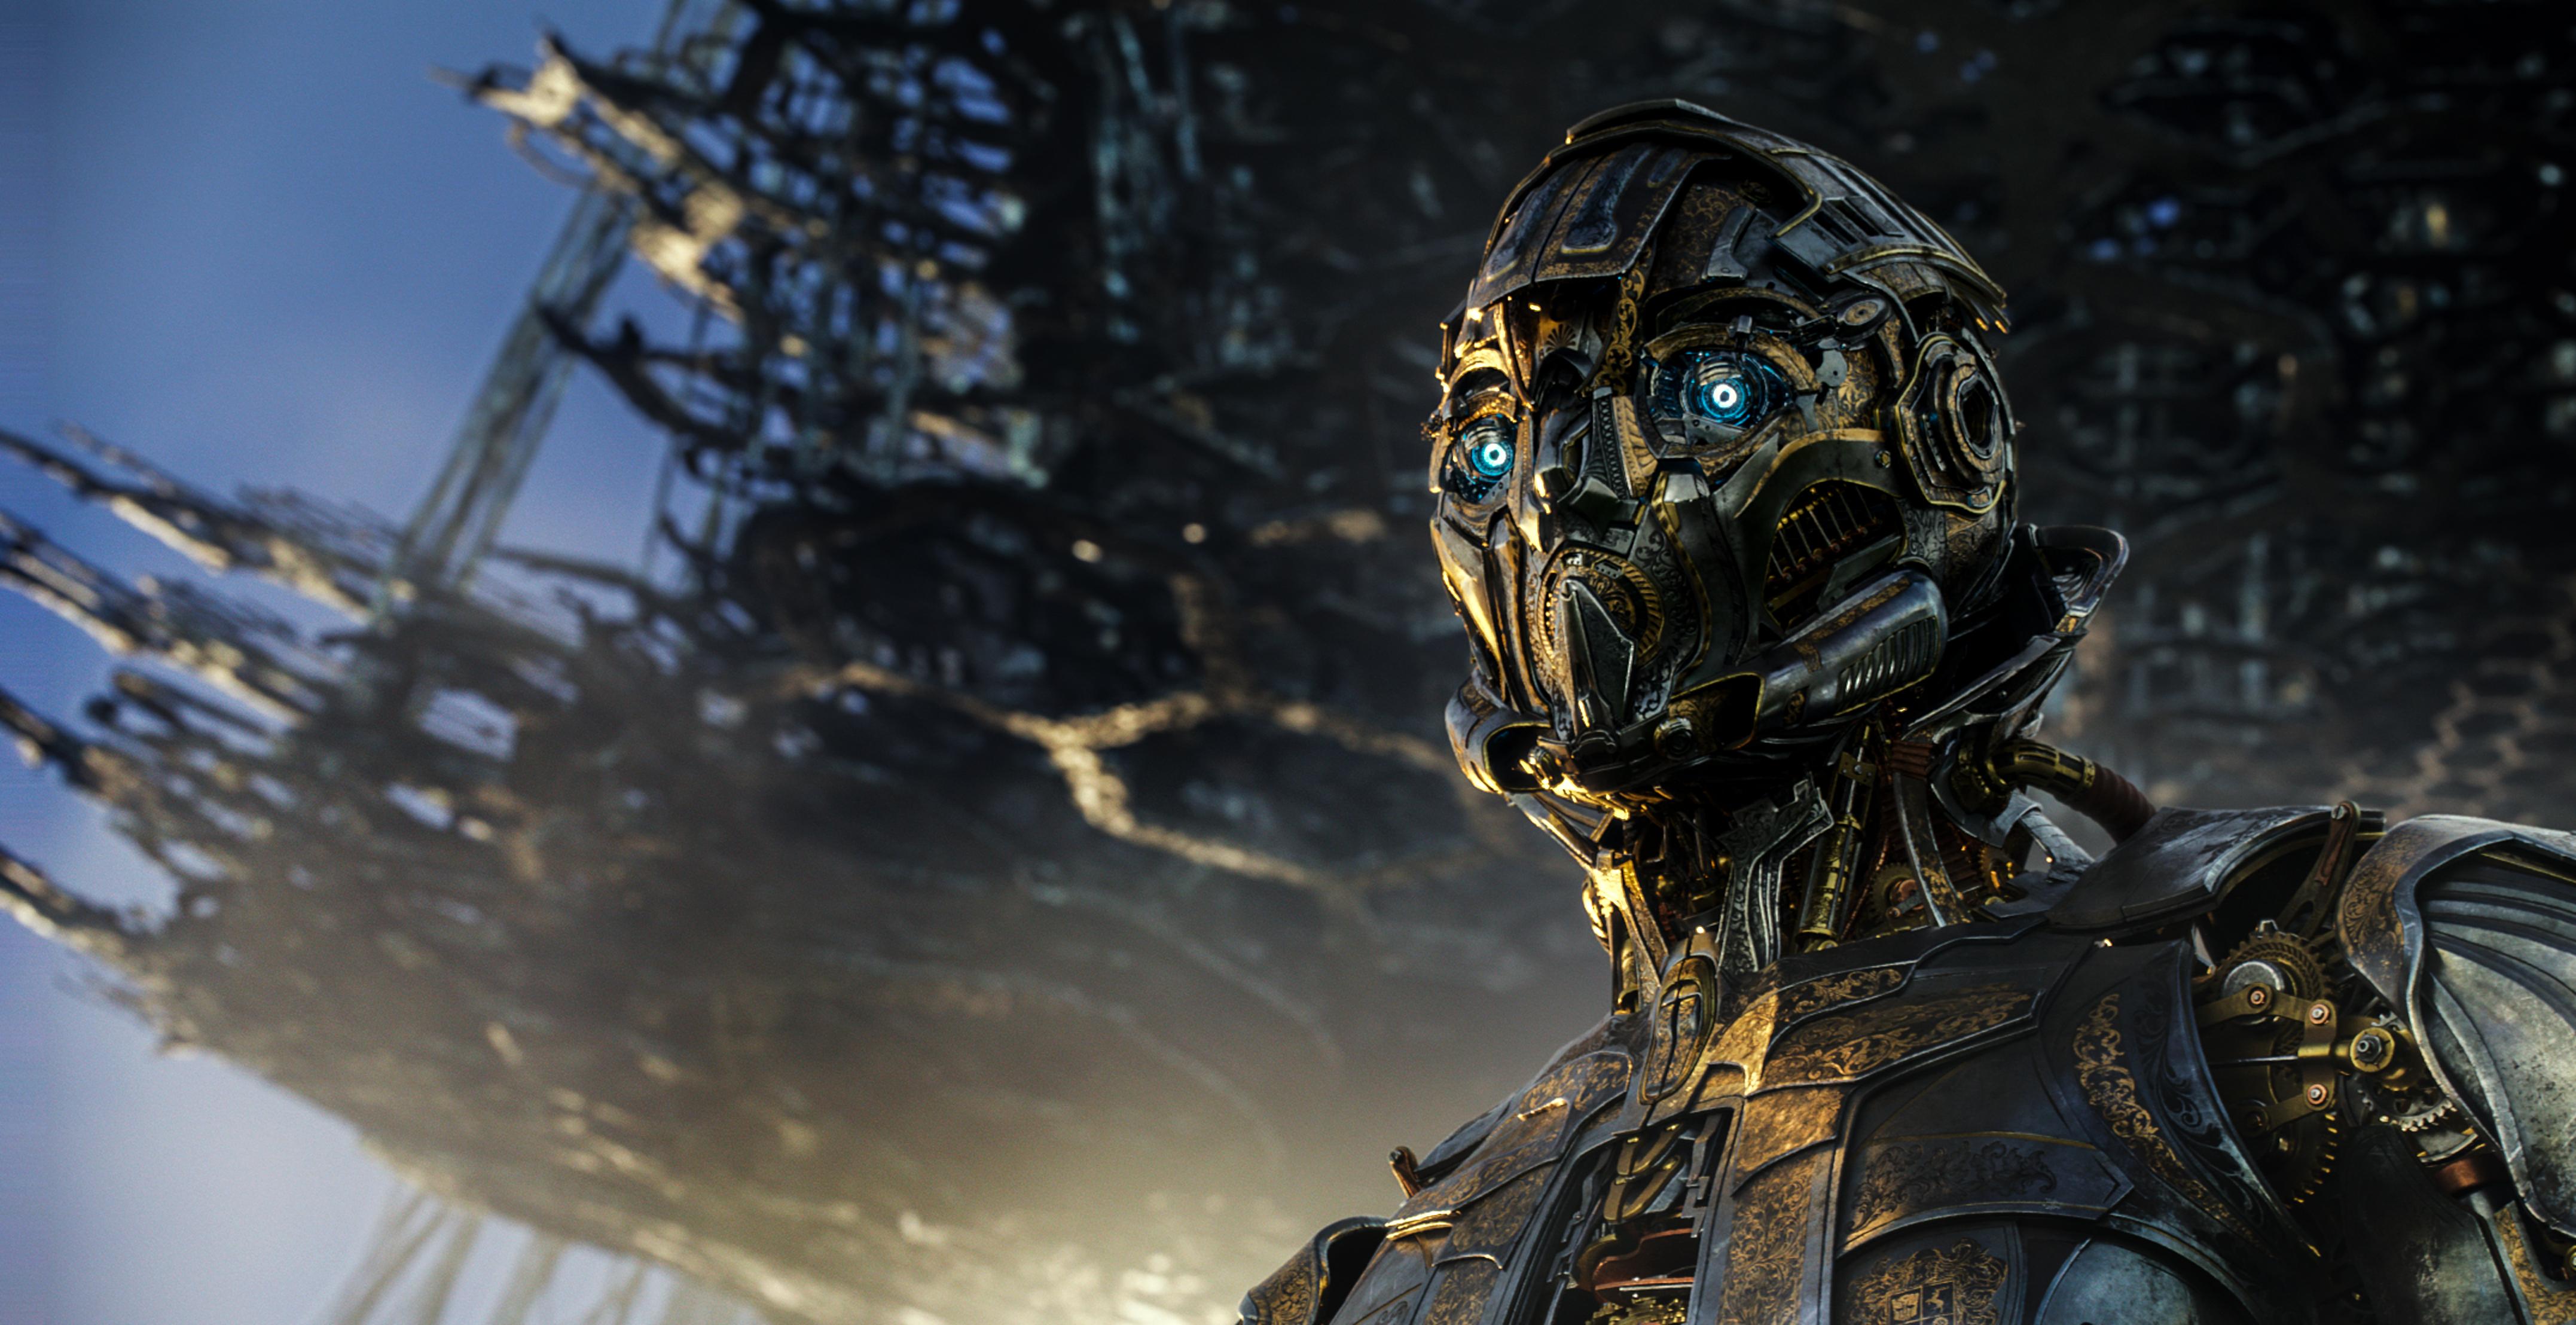 new movie stills from transformers the last knight